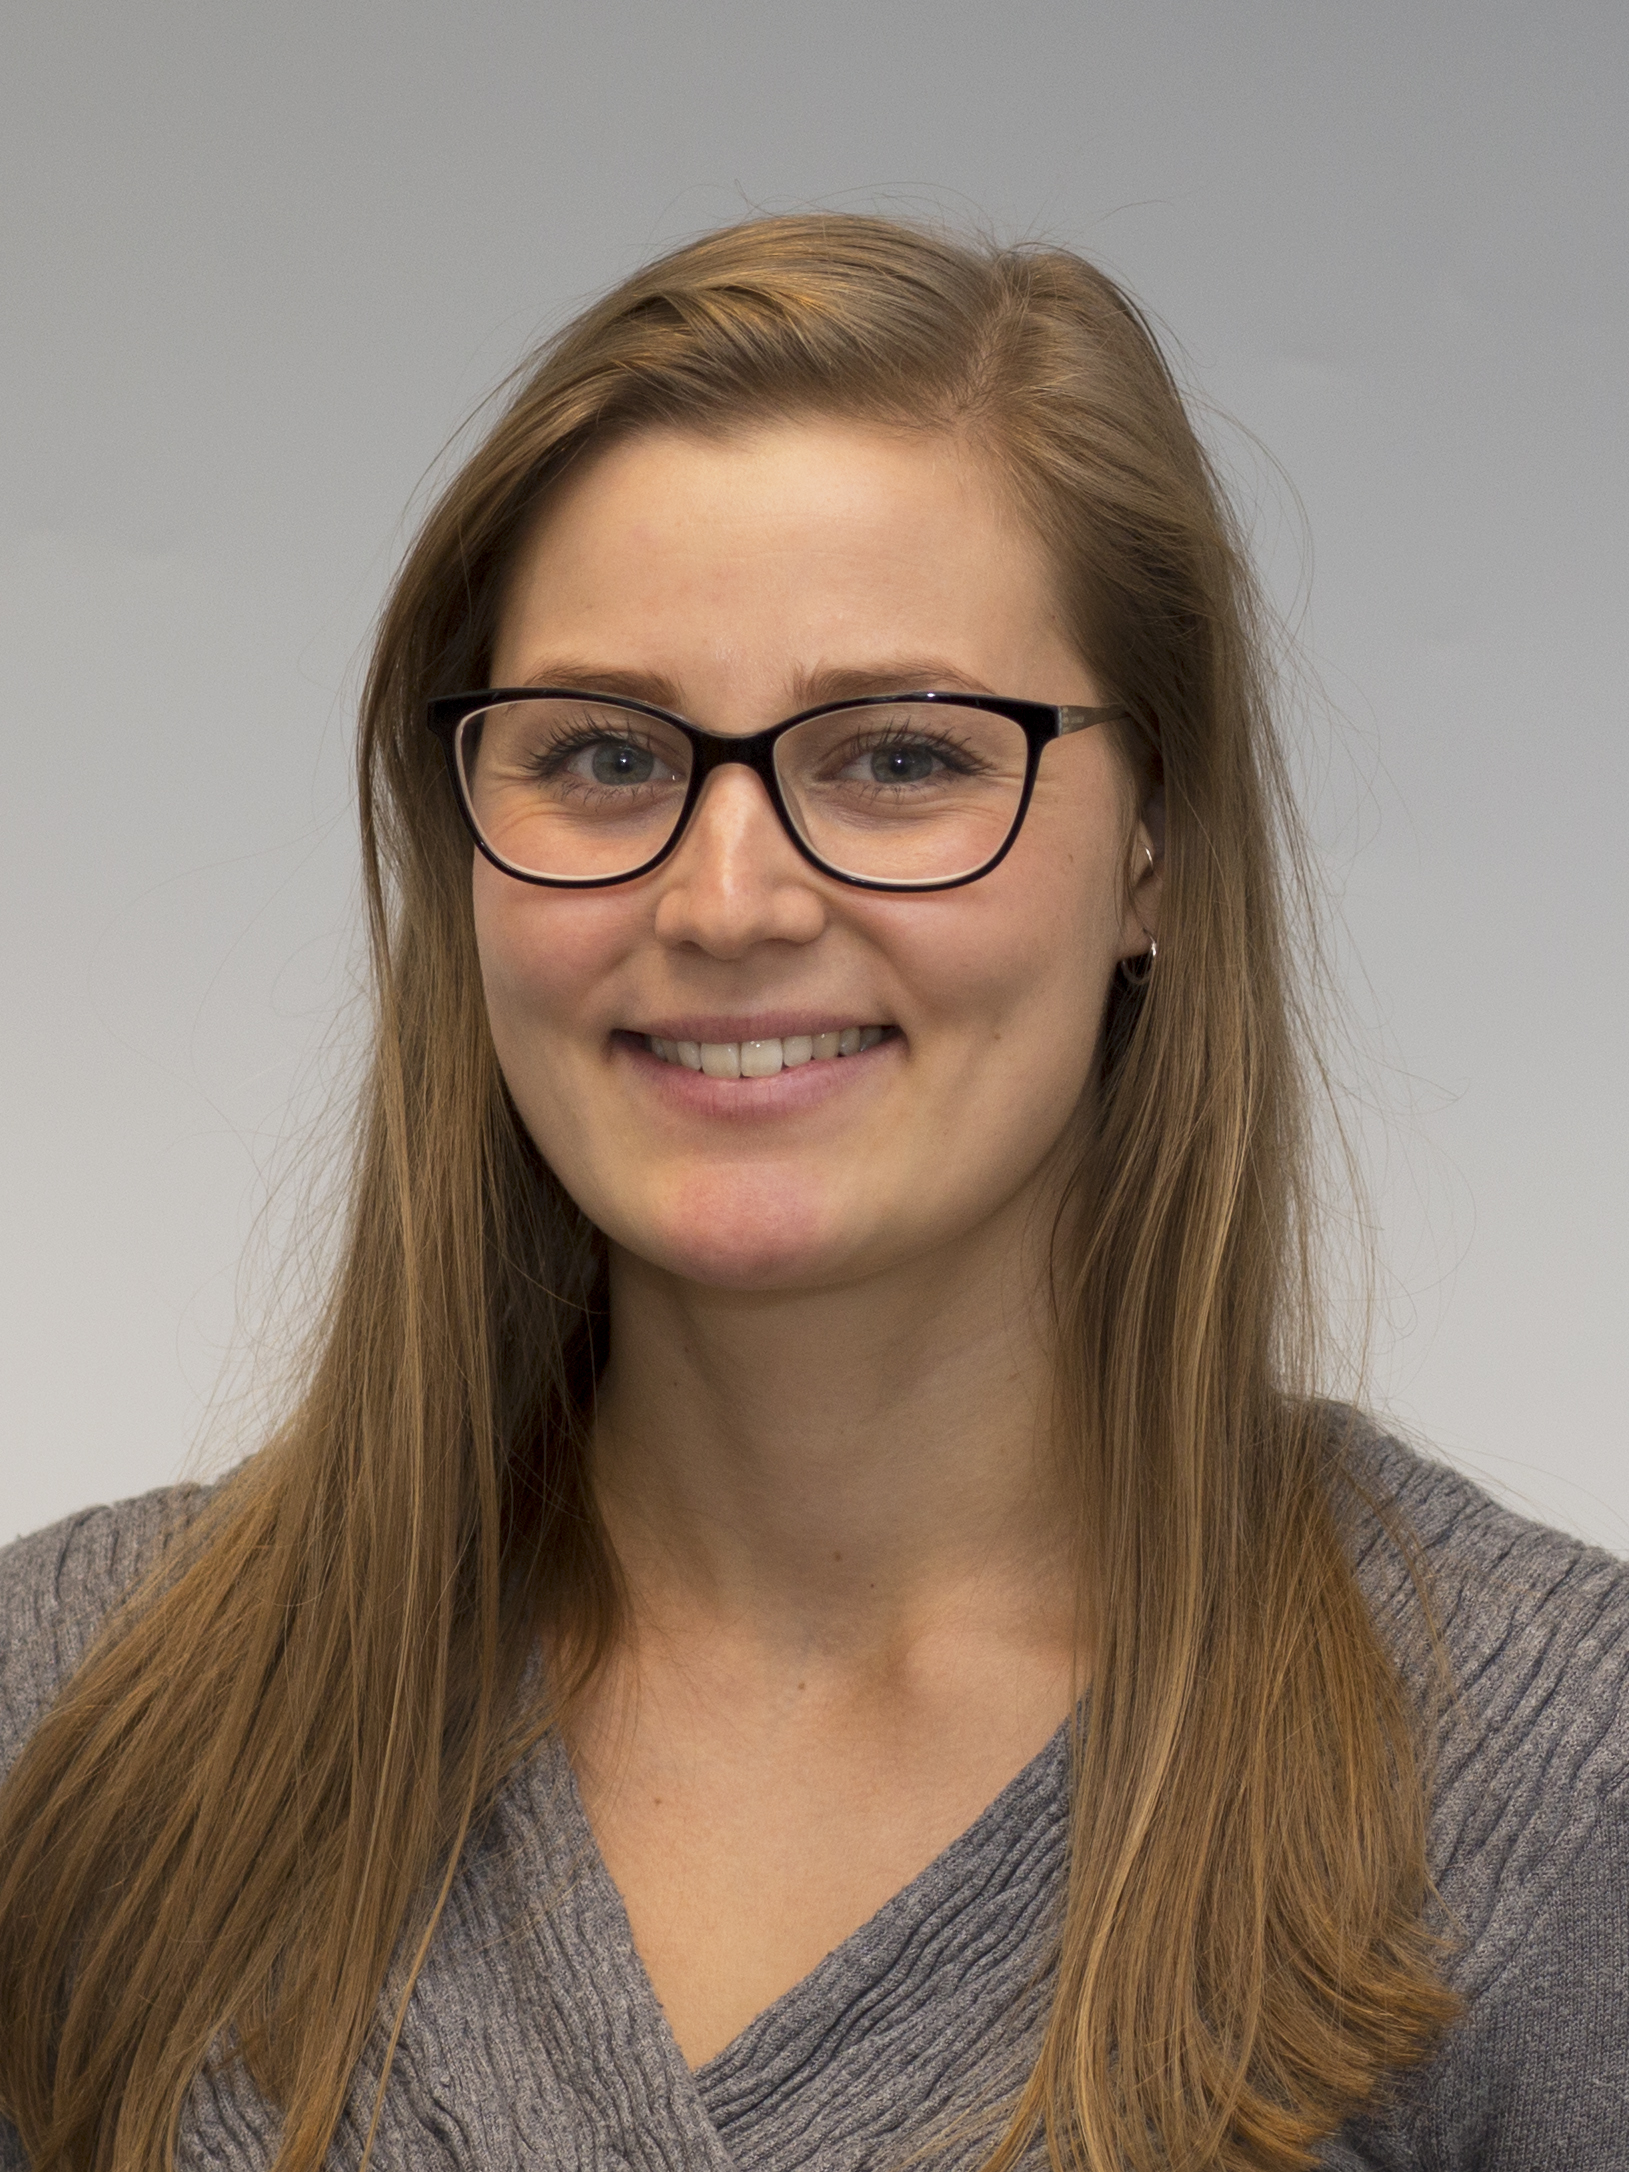 Nina Møller Tauber